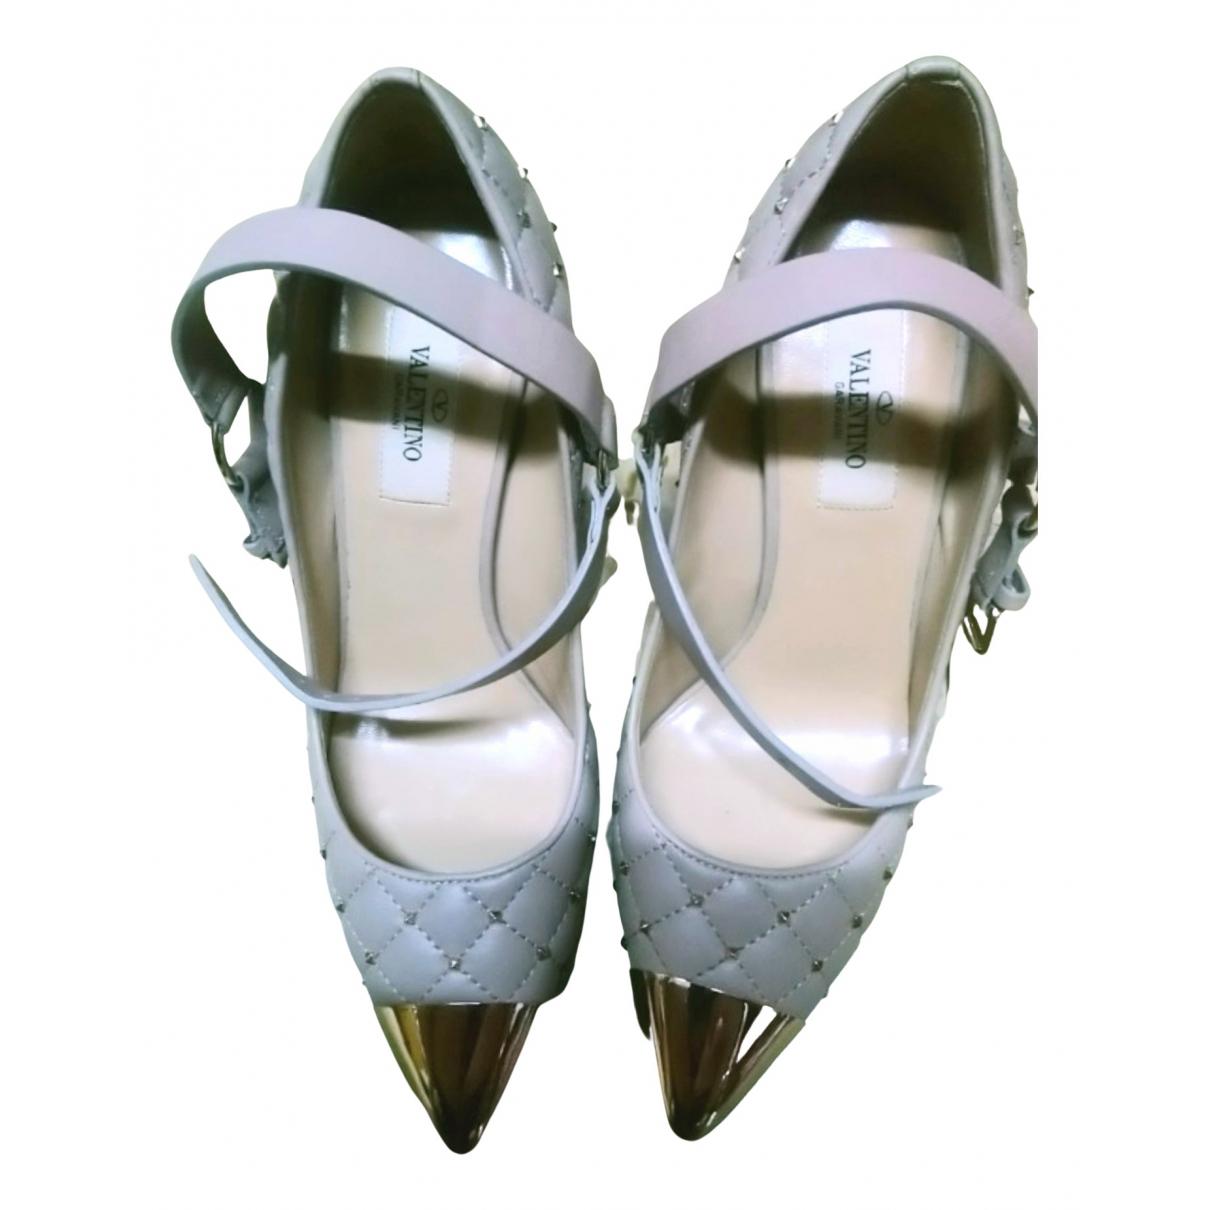 Valentino Garavani Rockstud Spike Pink Leather Heels for Women 36 EU